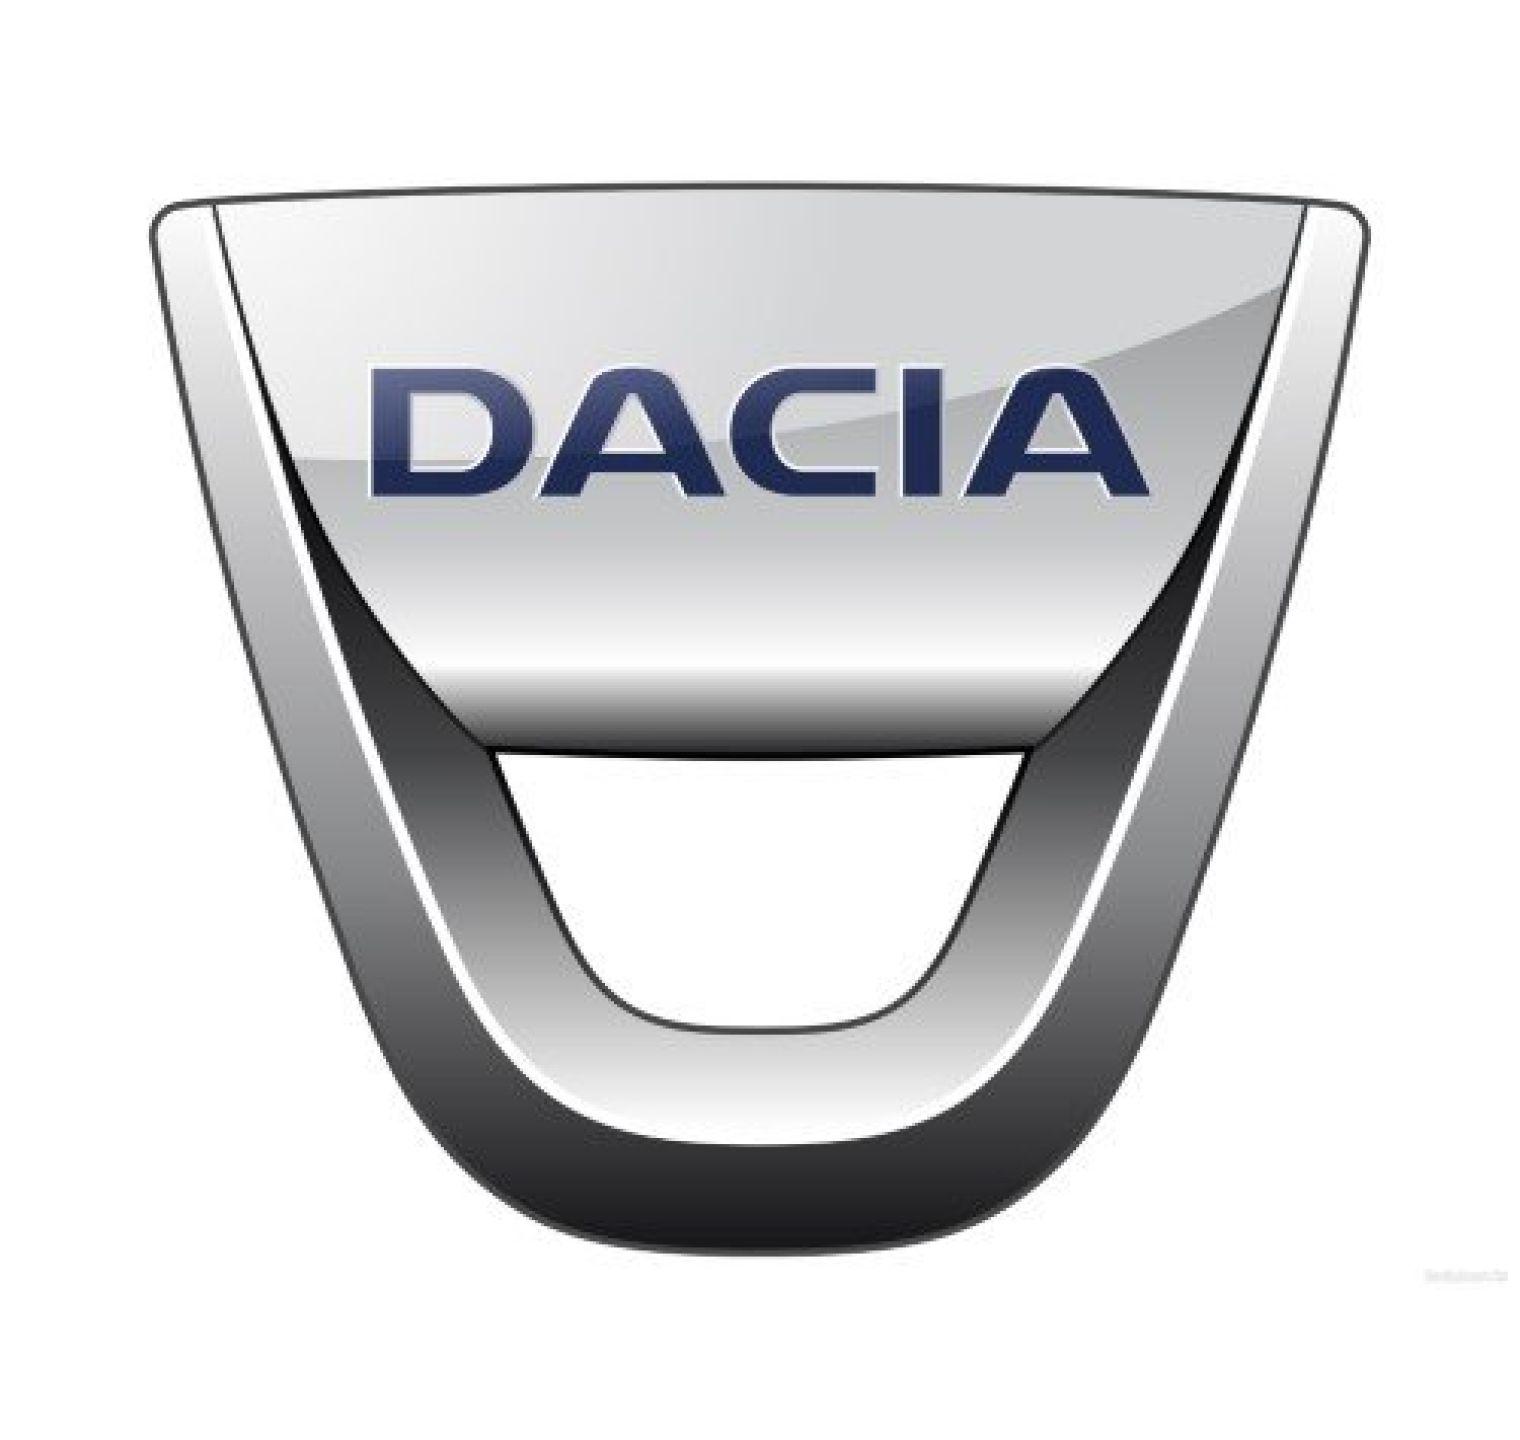 Dacia Sandero (vanaf 2008) - achterruitenwisser Valeo Silencio flatblade